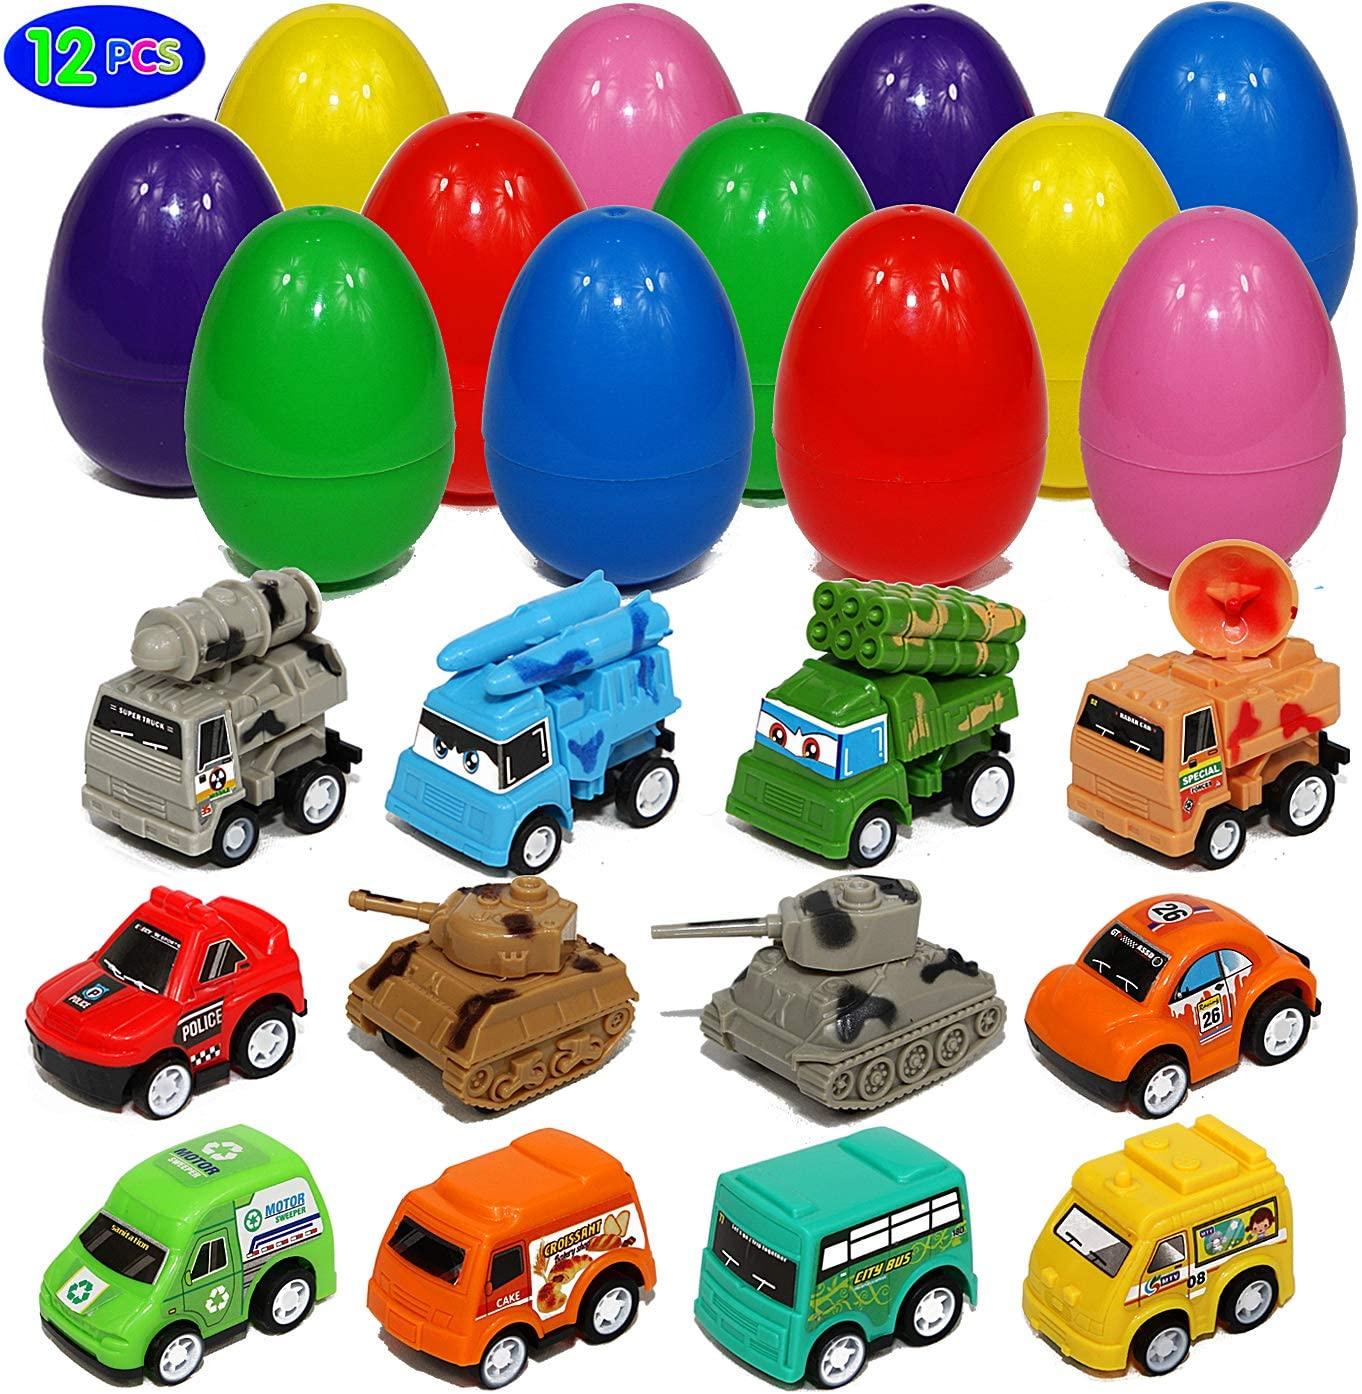 Toy Filled Large Easter Eggs with Pull-Back Vehicles Cars Trucks Tank Big Surprise Egg Hunt Basket Filler for Kids Boys and Girls